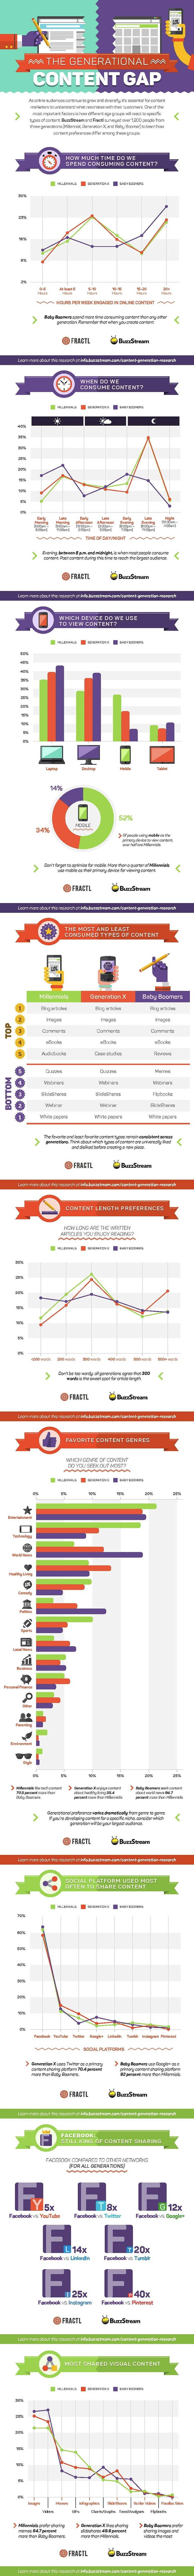 Online Content Infographic